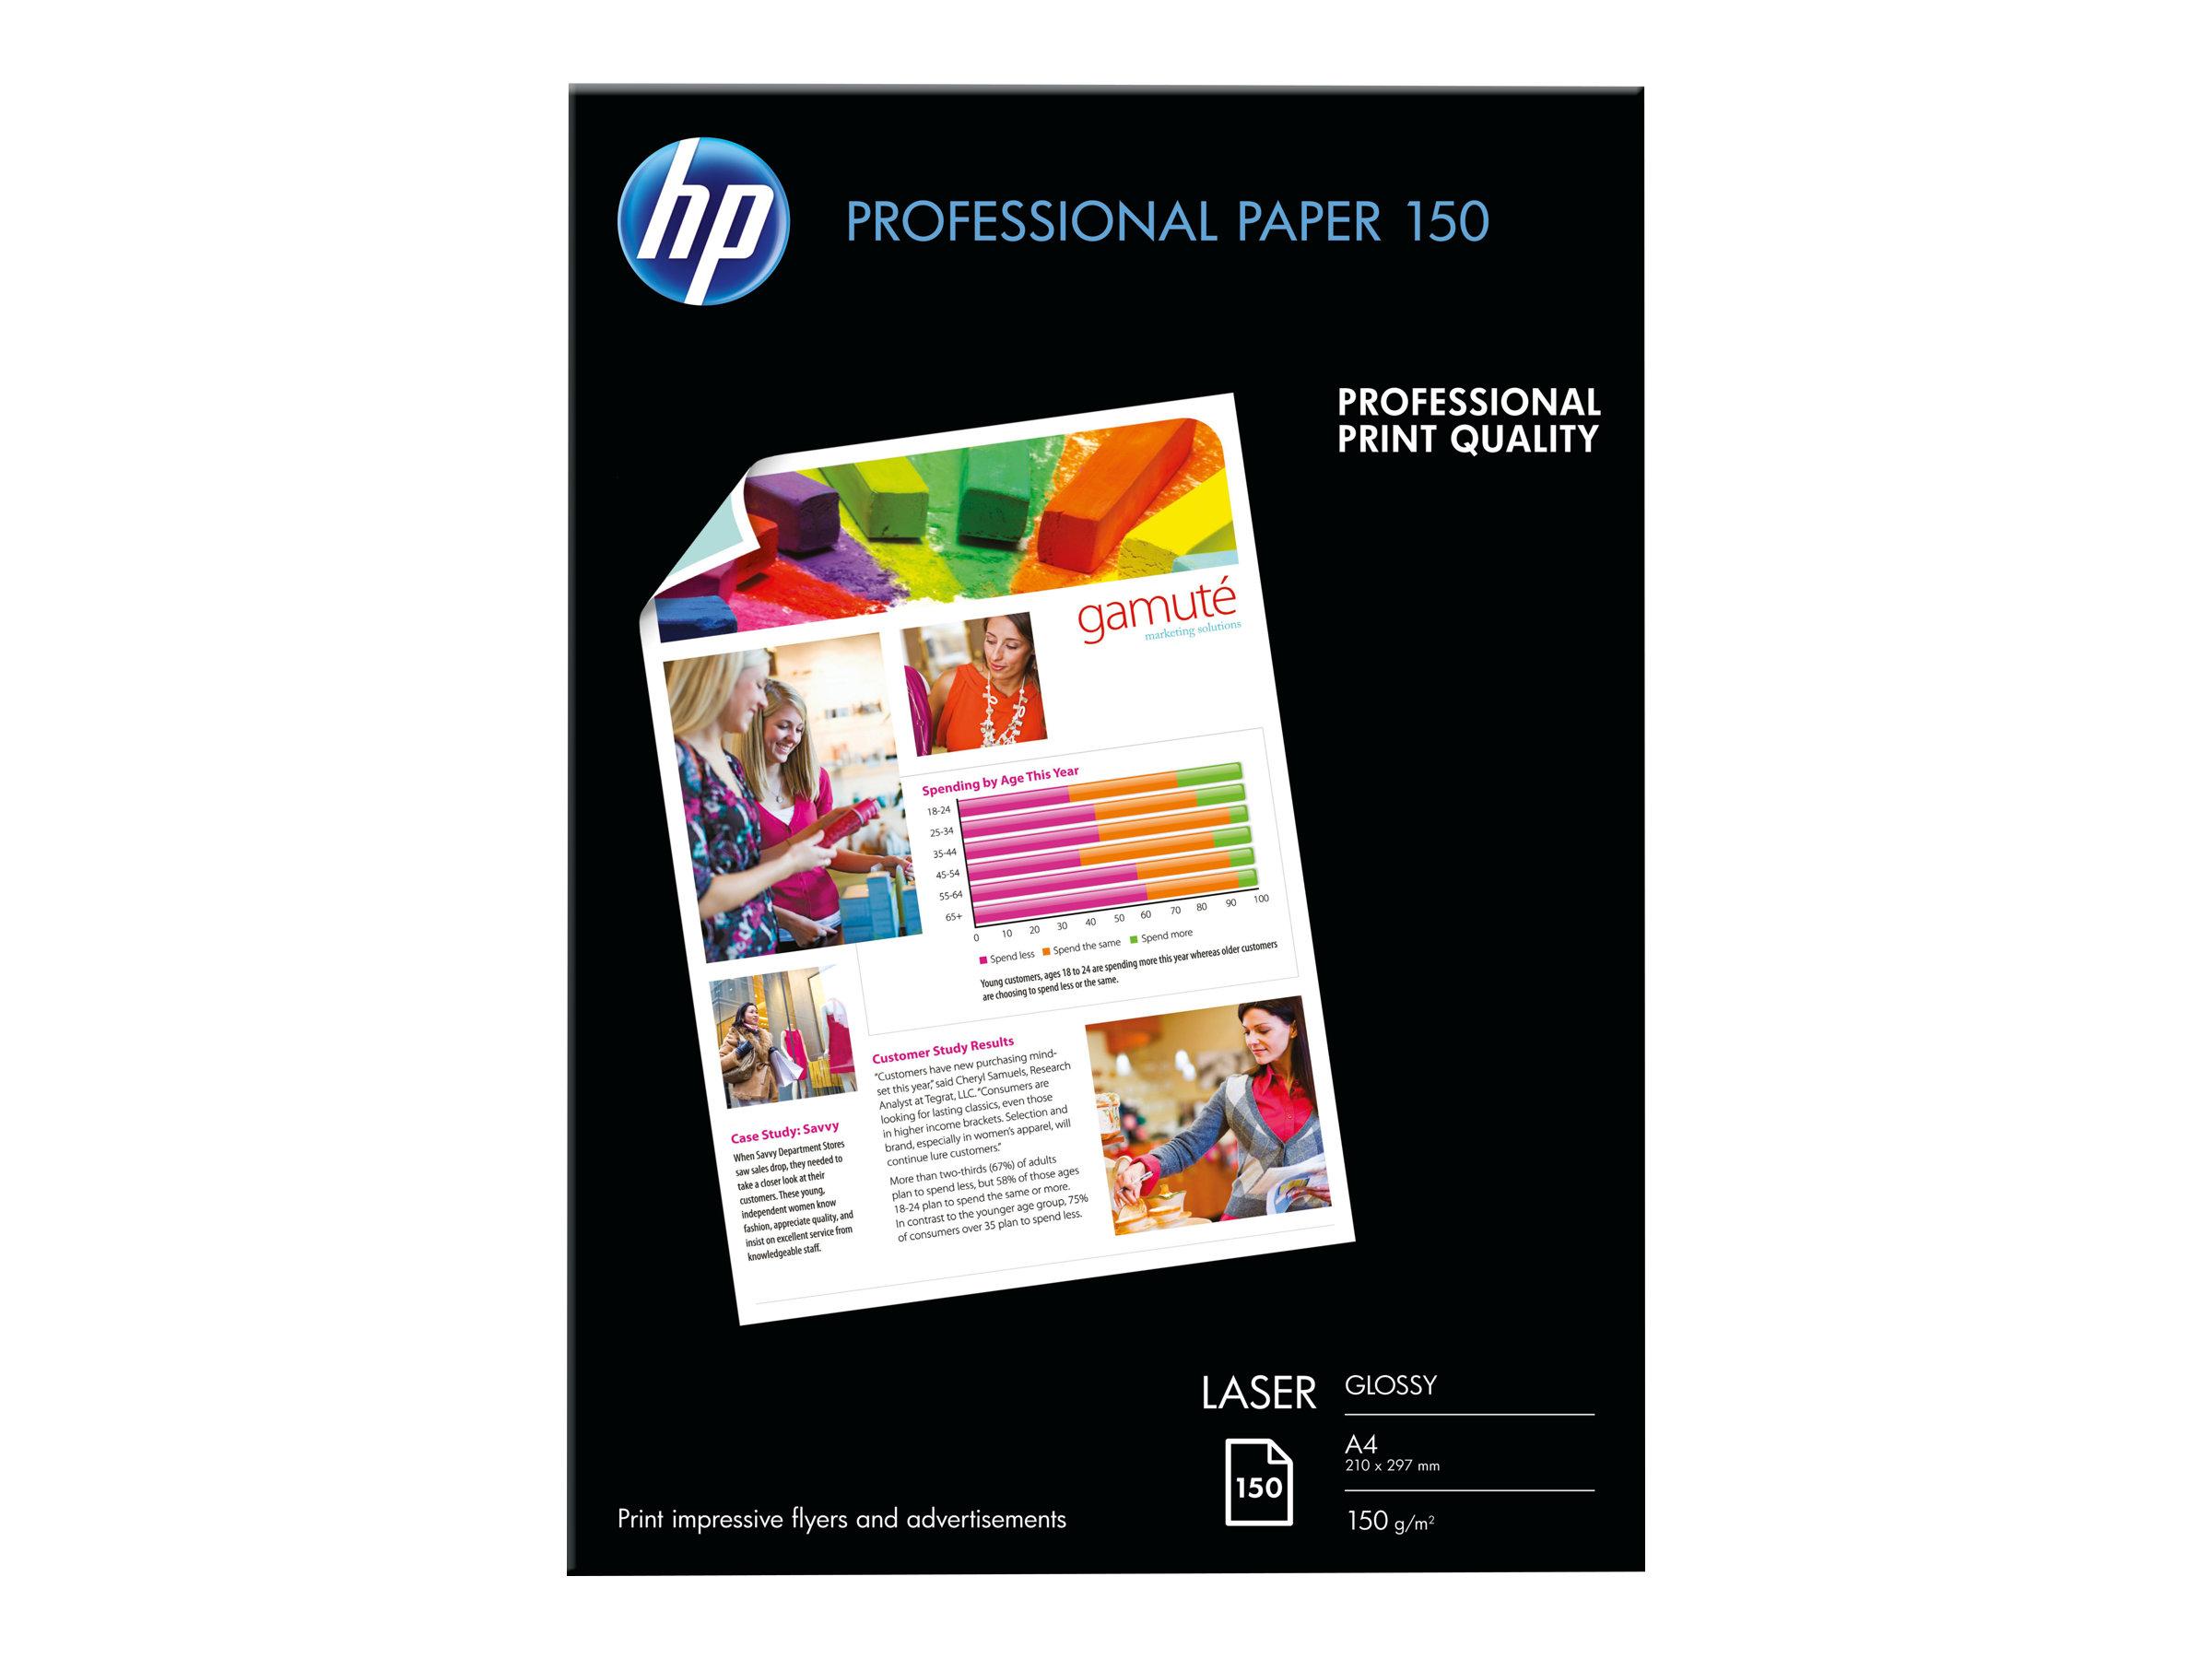 Hp professional glossy paper glaenzend a4 210 x 297 mm 150 g m 150 blatt fotopapier fuer laserjet mfp m42625 mfp m438 mfp m442 mfp m443 neverstop 1001 1202 1493248 cg965a